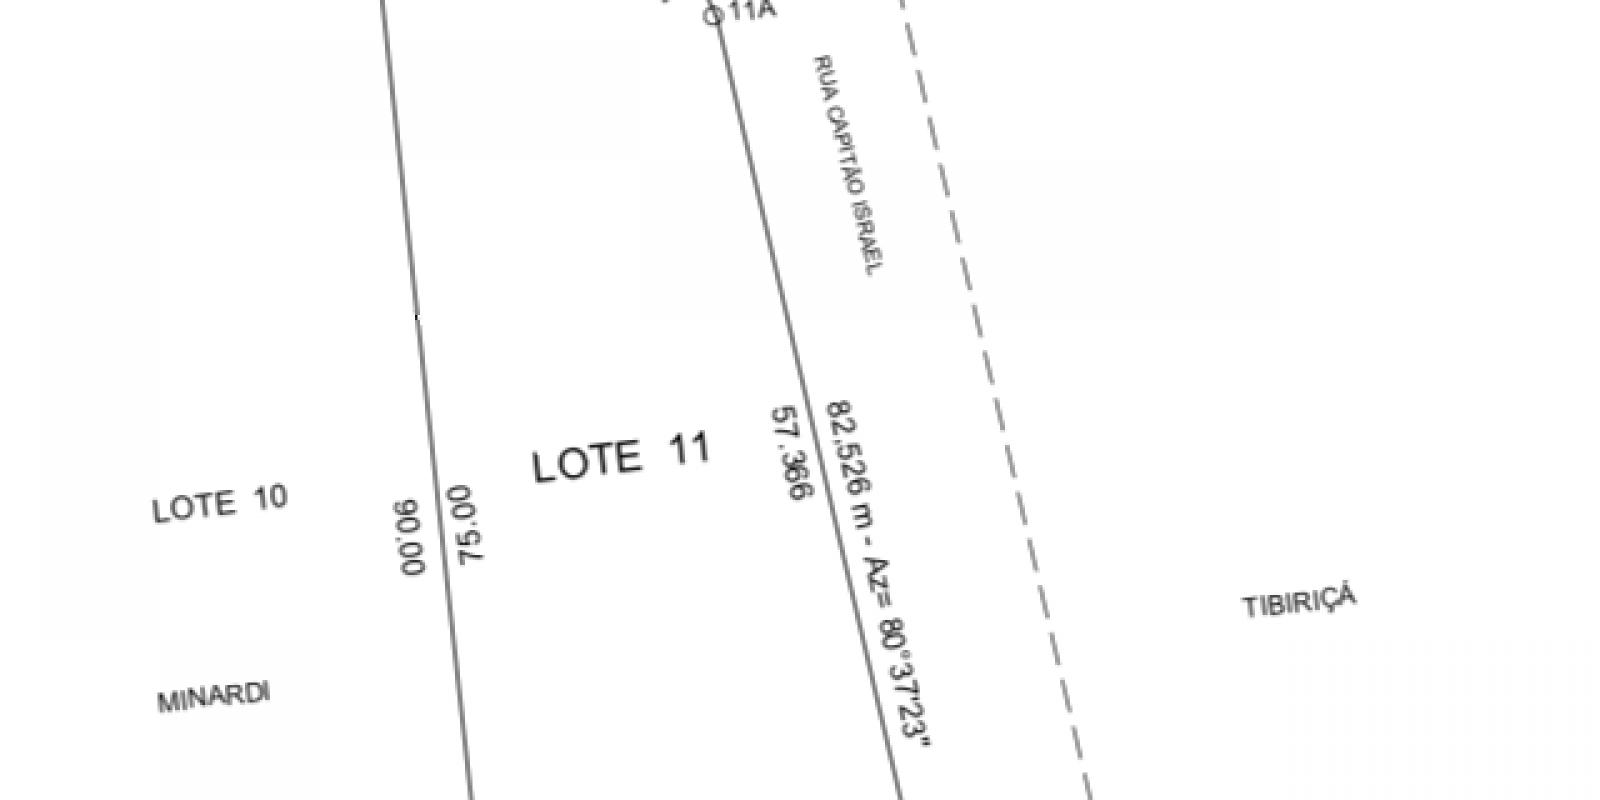 Terreno na rodovia SP 255 - Foto 2 de 5